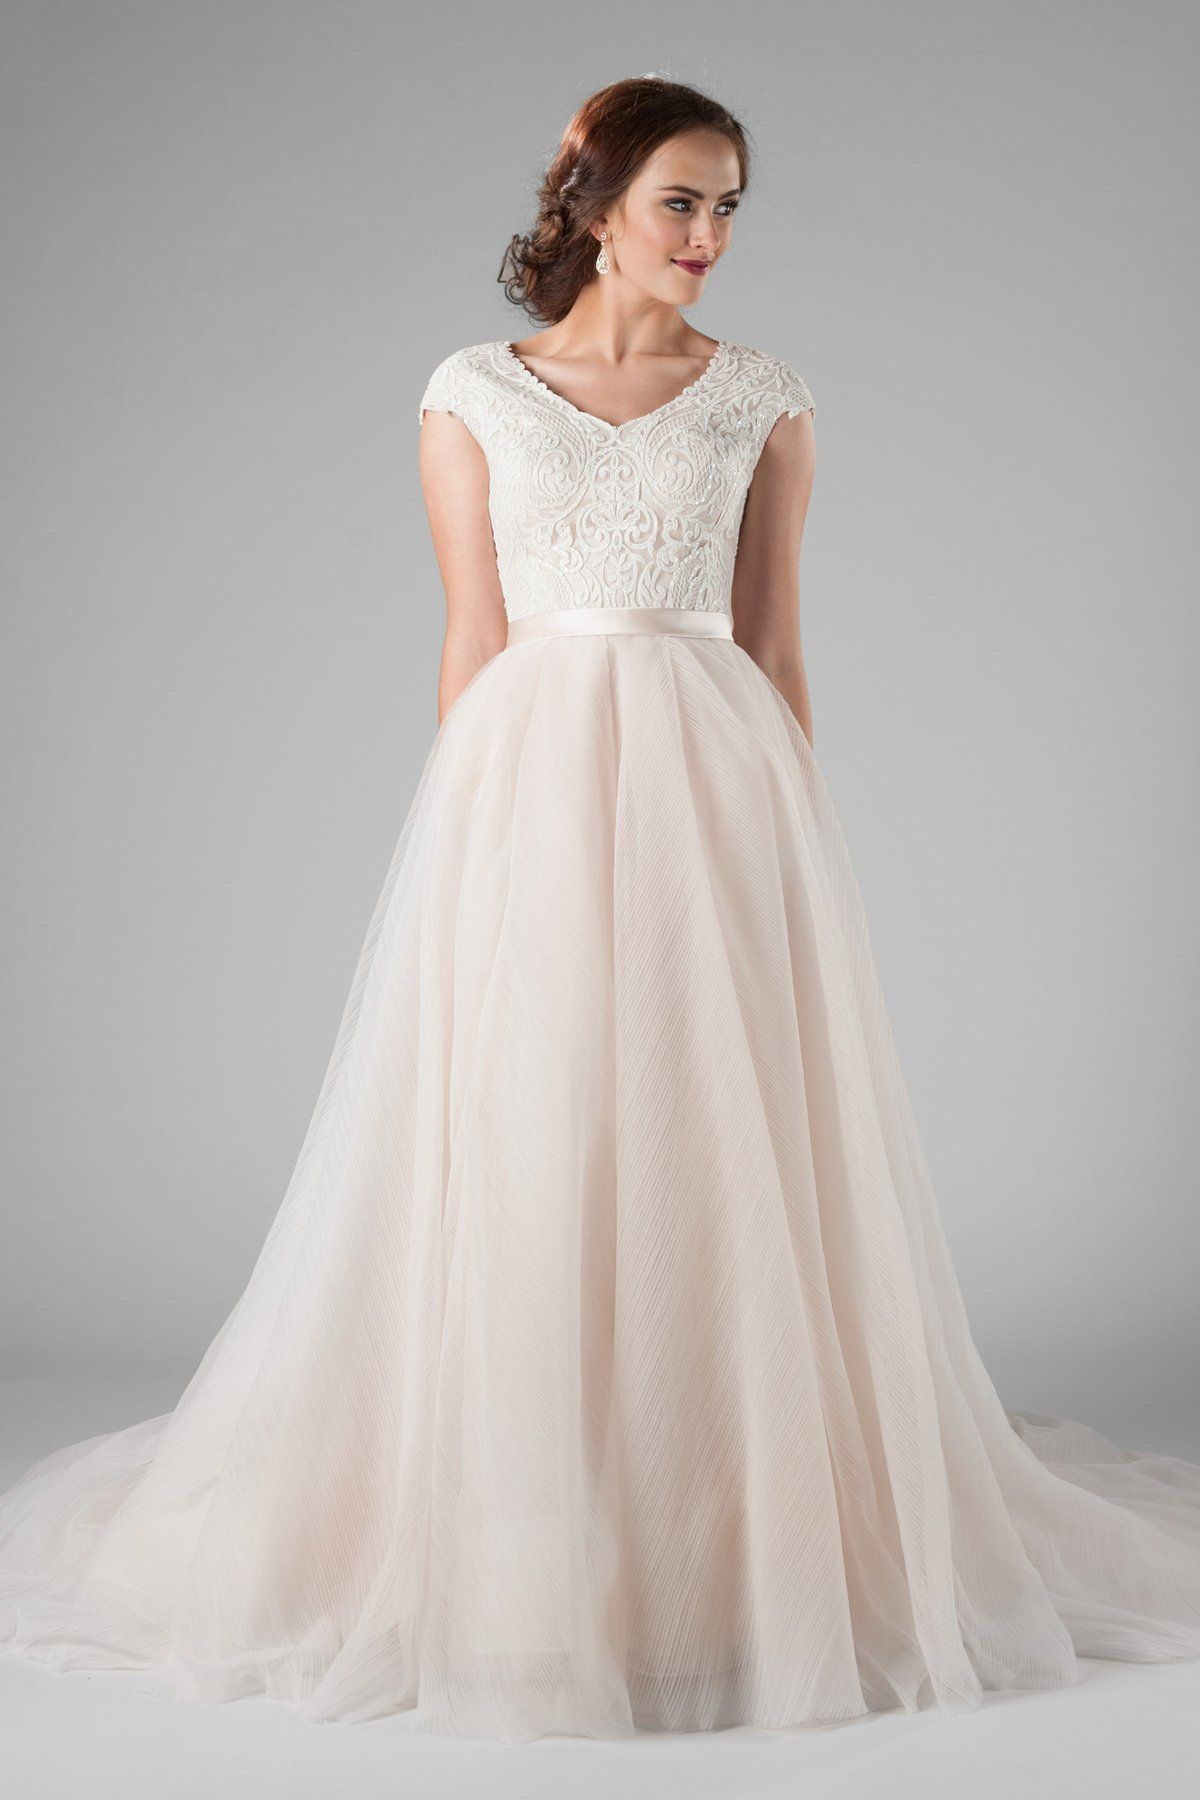 Tiana Modest Wedding Dresses Perfect Wedding Dress Wedding Dresses [ 1800 x 1200 Pixel ]